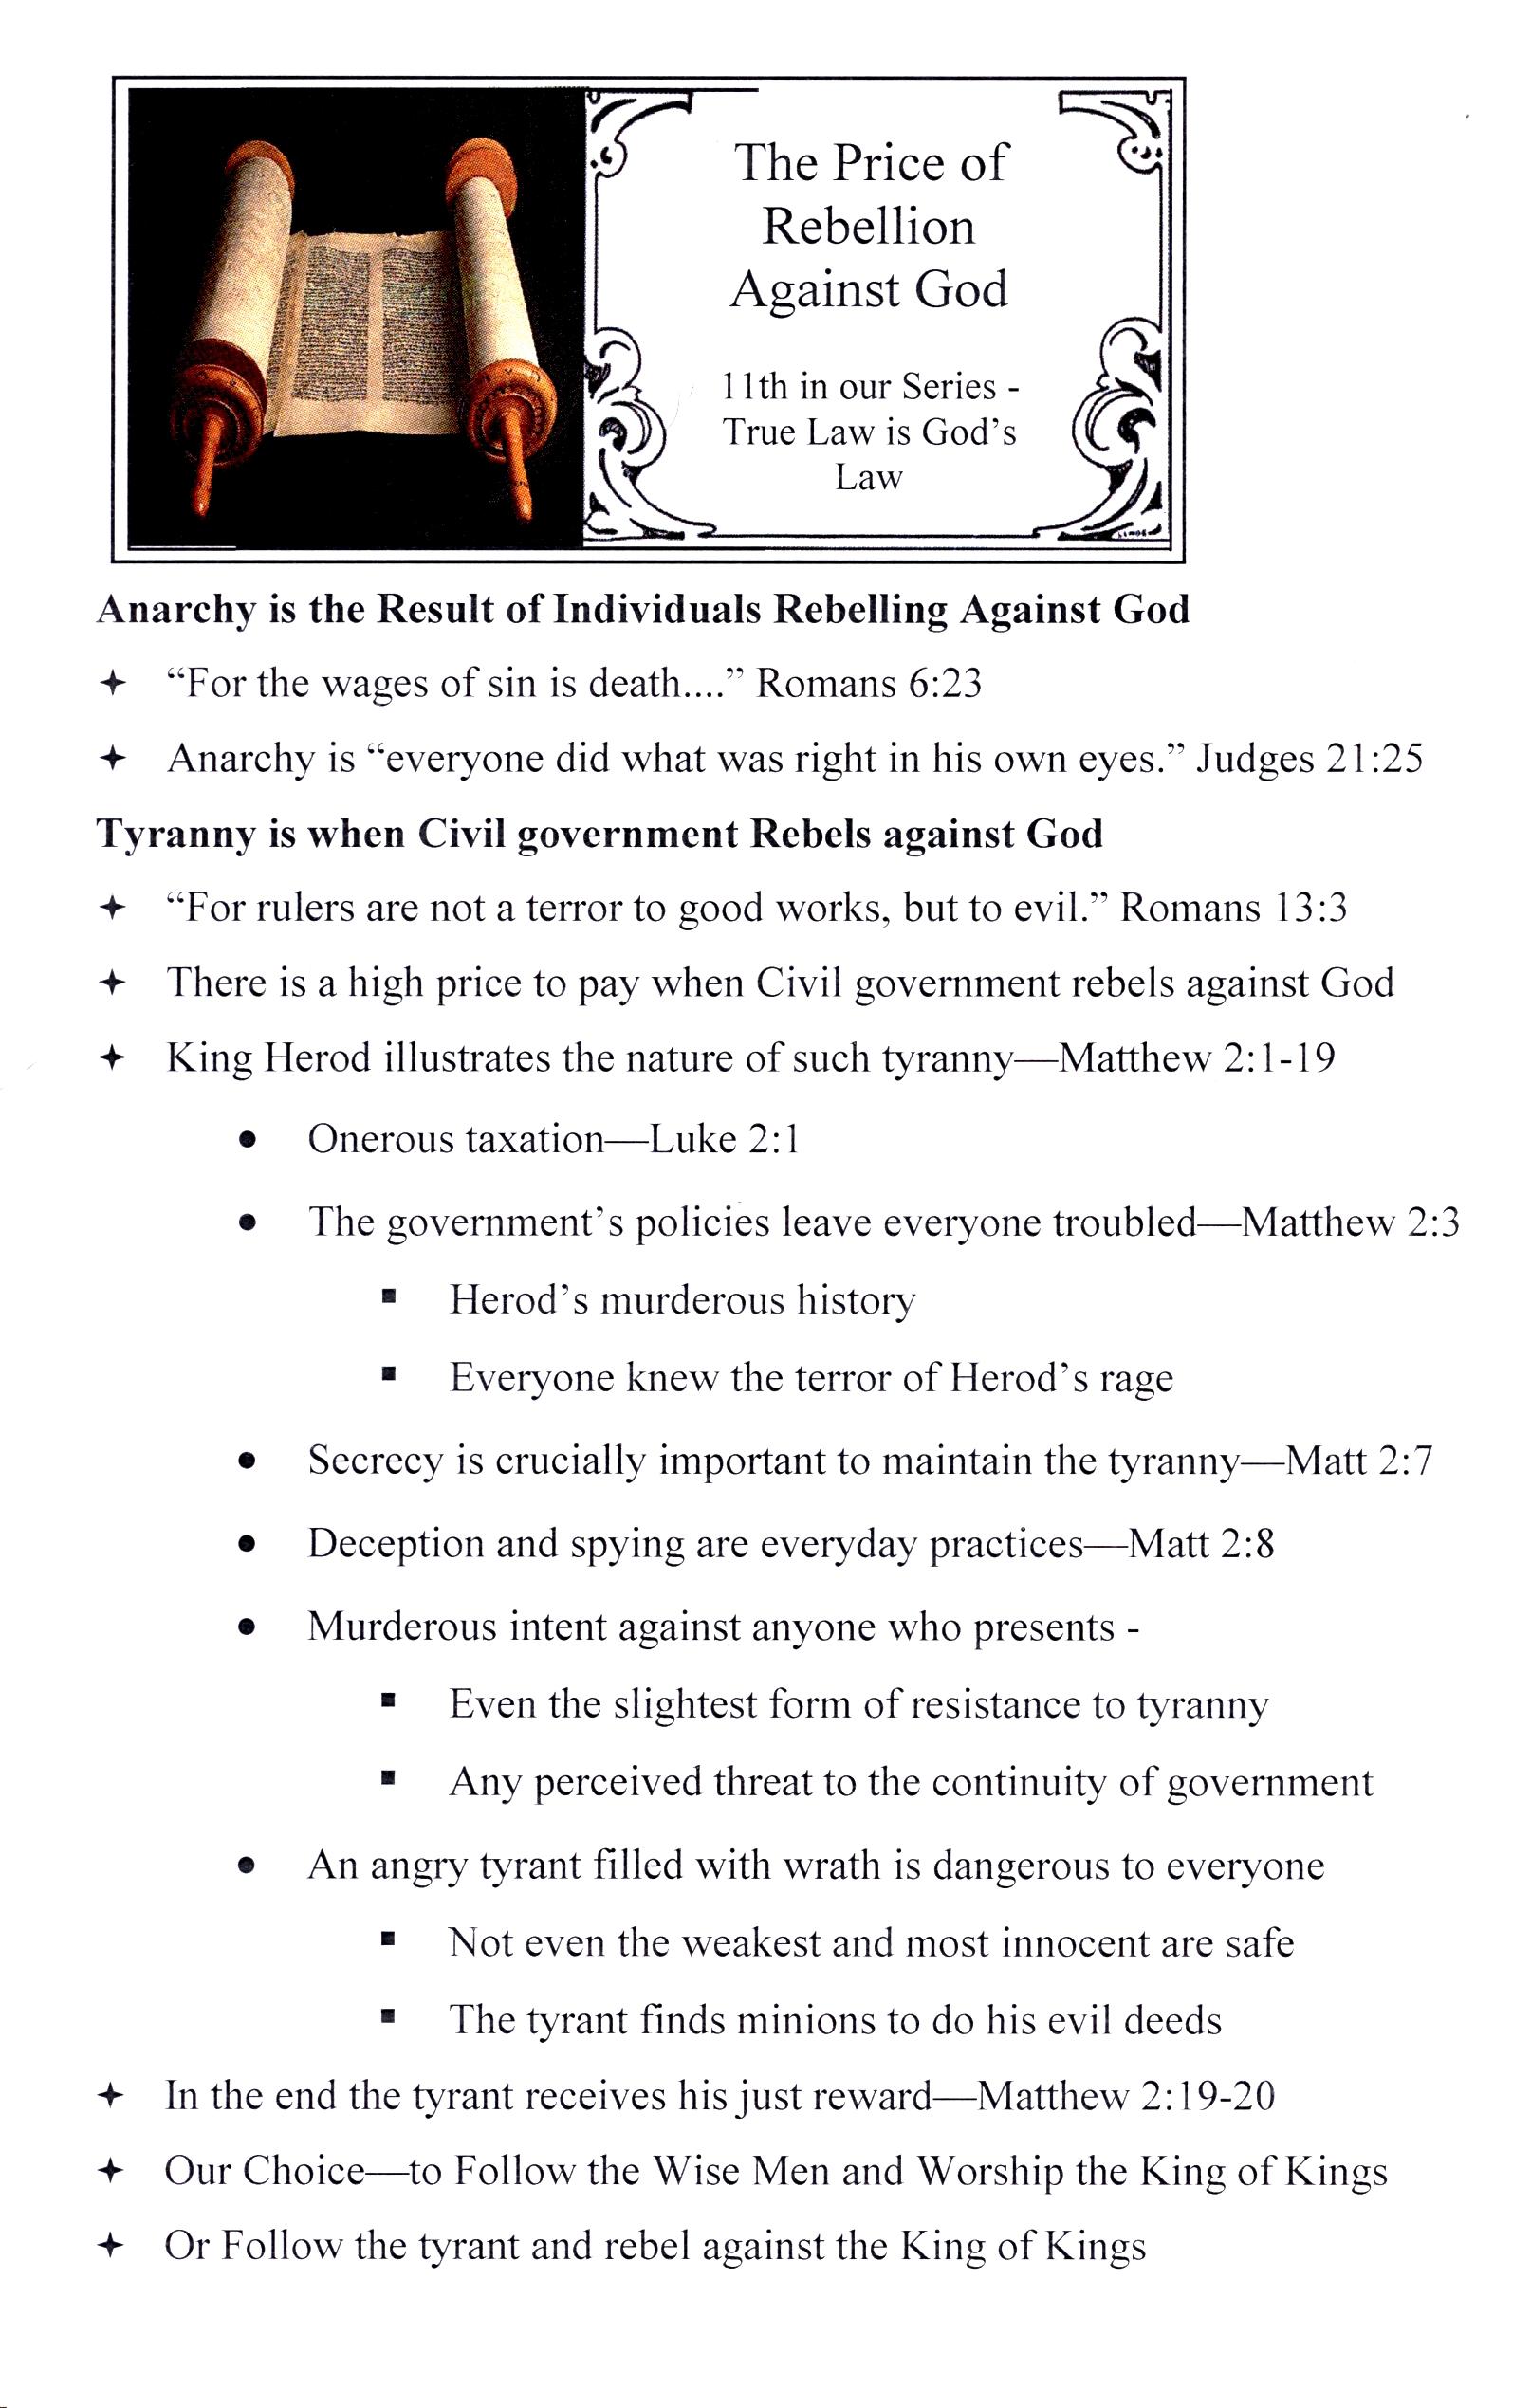 CEFC True Law is God's Law